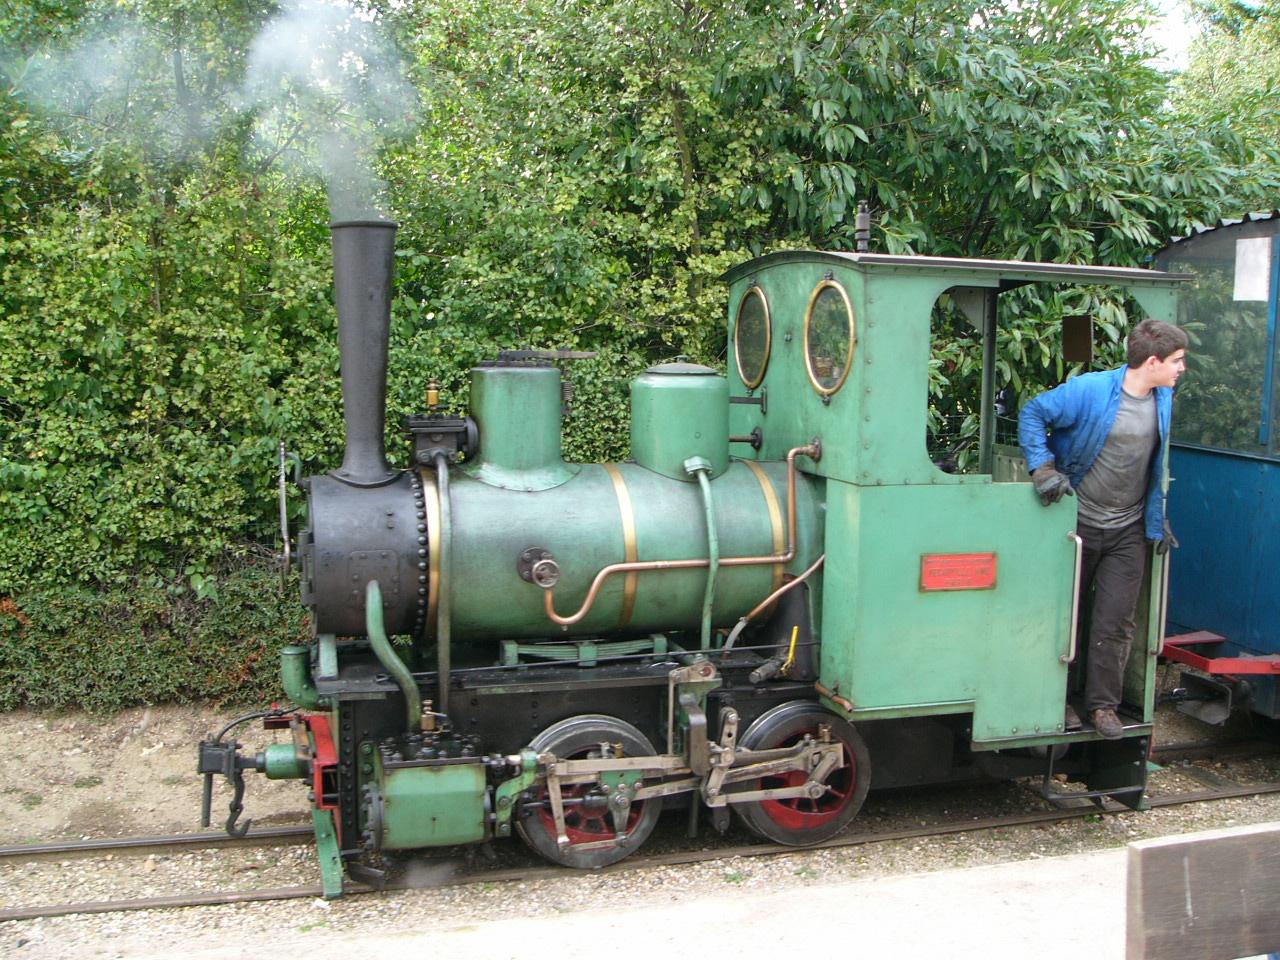 Thomas The Engine Cream Cake